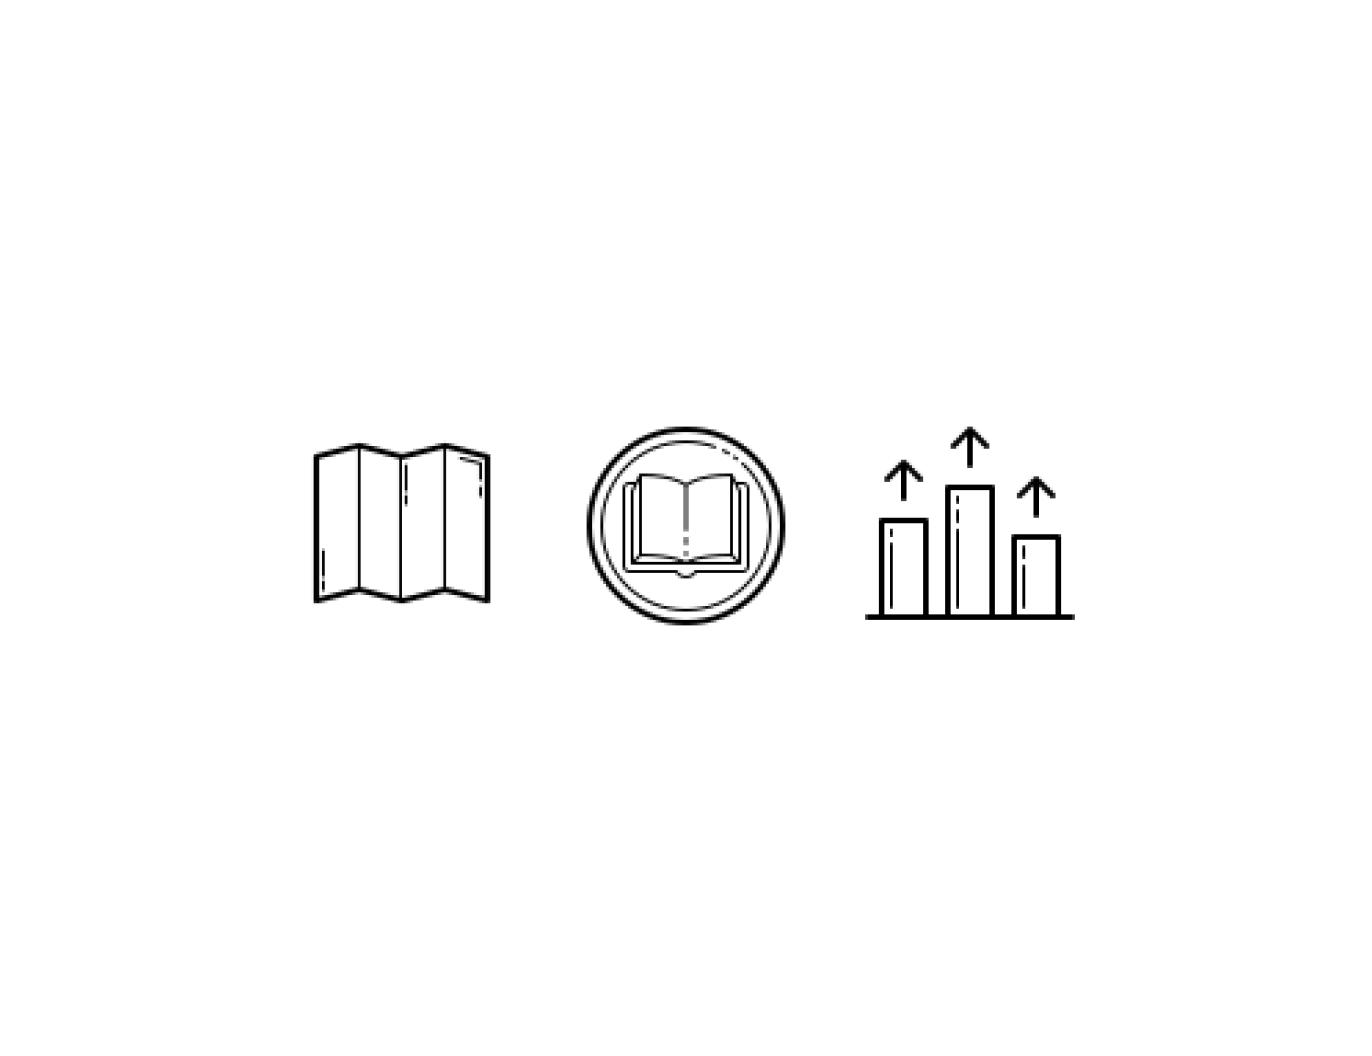 Symbols for Roadmap to Success